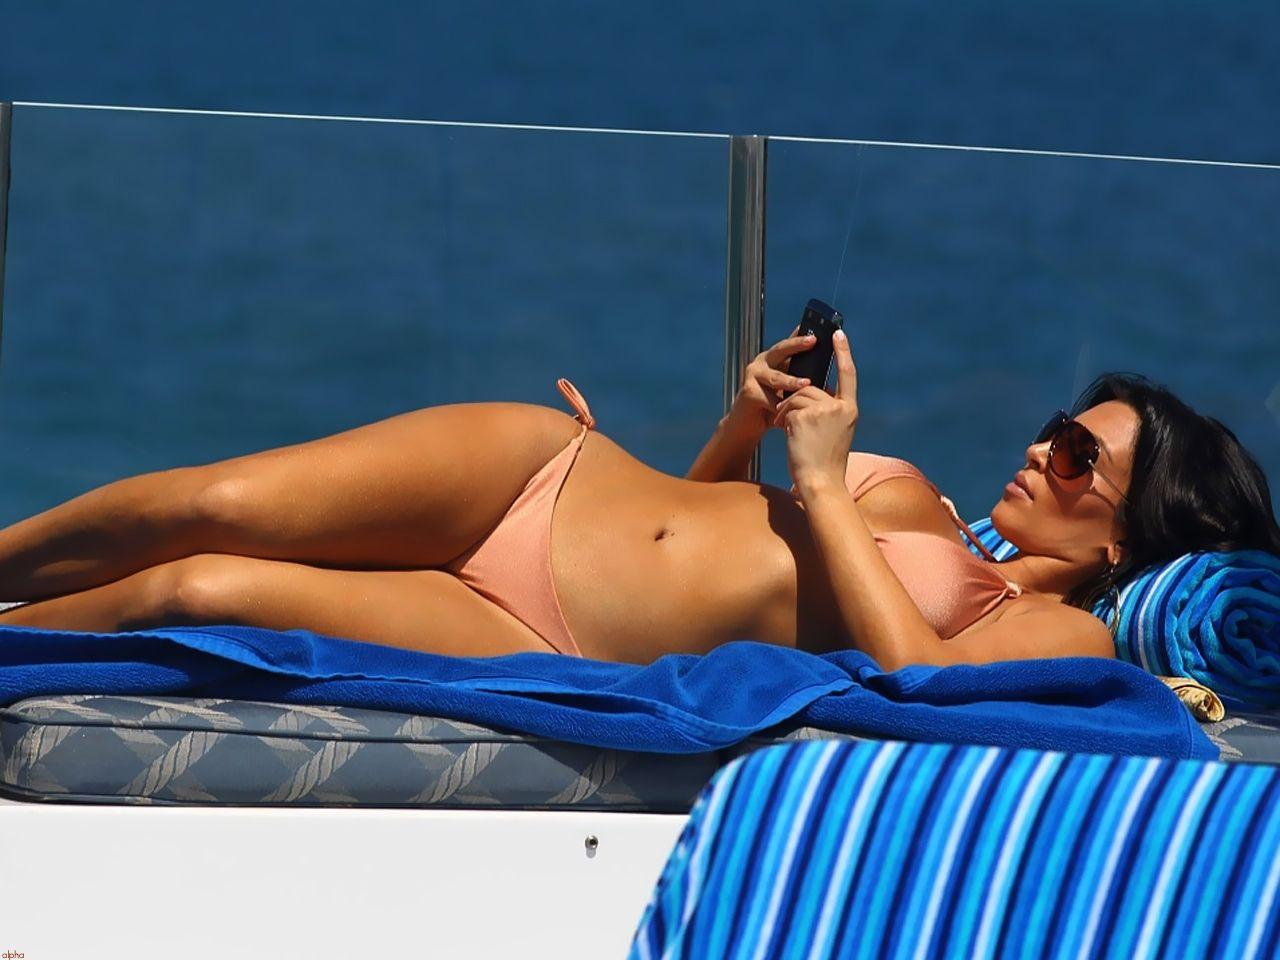 kort kardashian fully nude